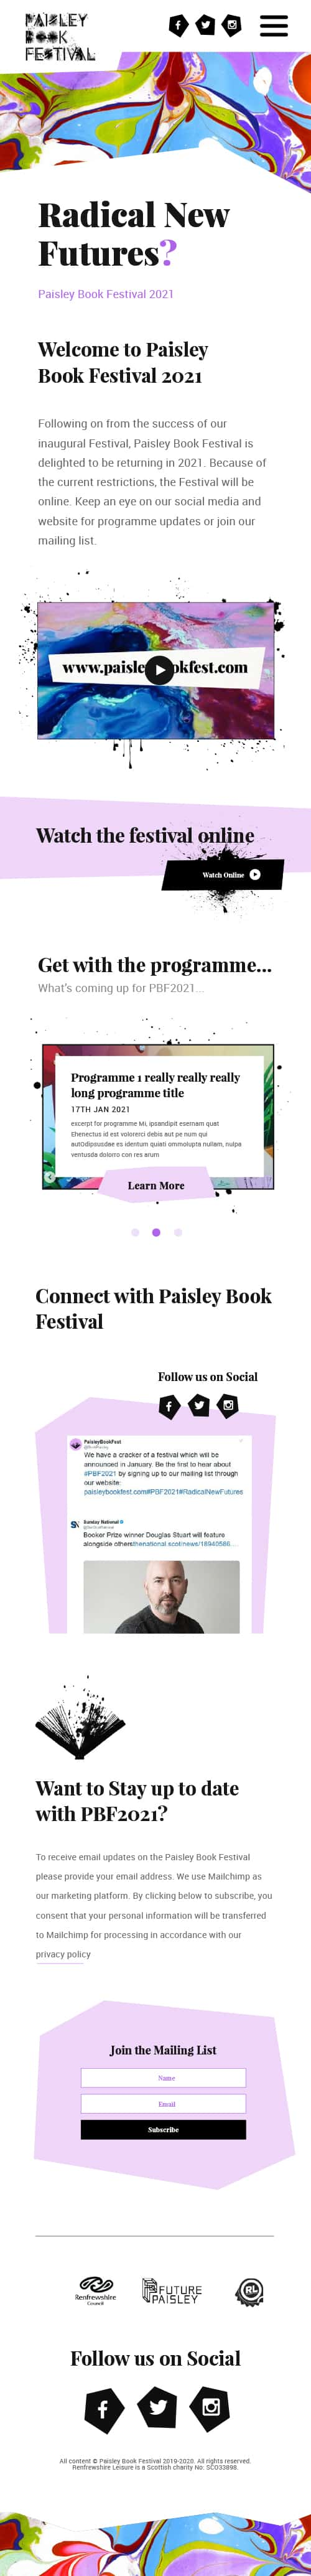 Mobile website for Paisley Book Festival 2021